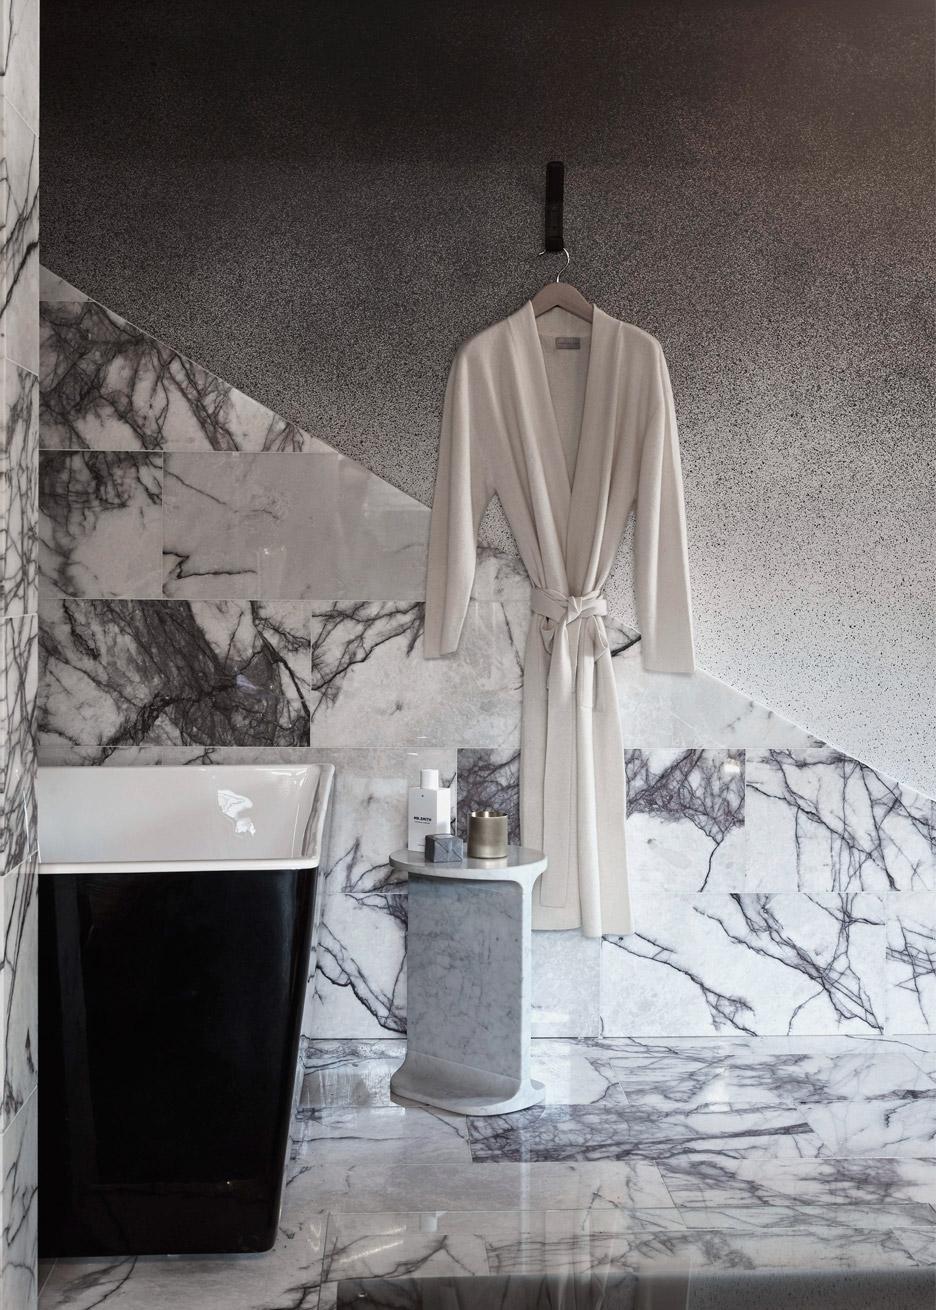 microlux-melbourne-australia-apartment-interior-design-edwards-moore_dezeen_936_8.jpg